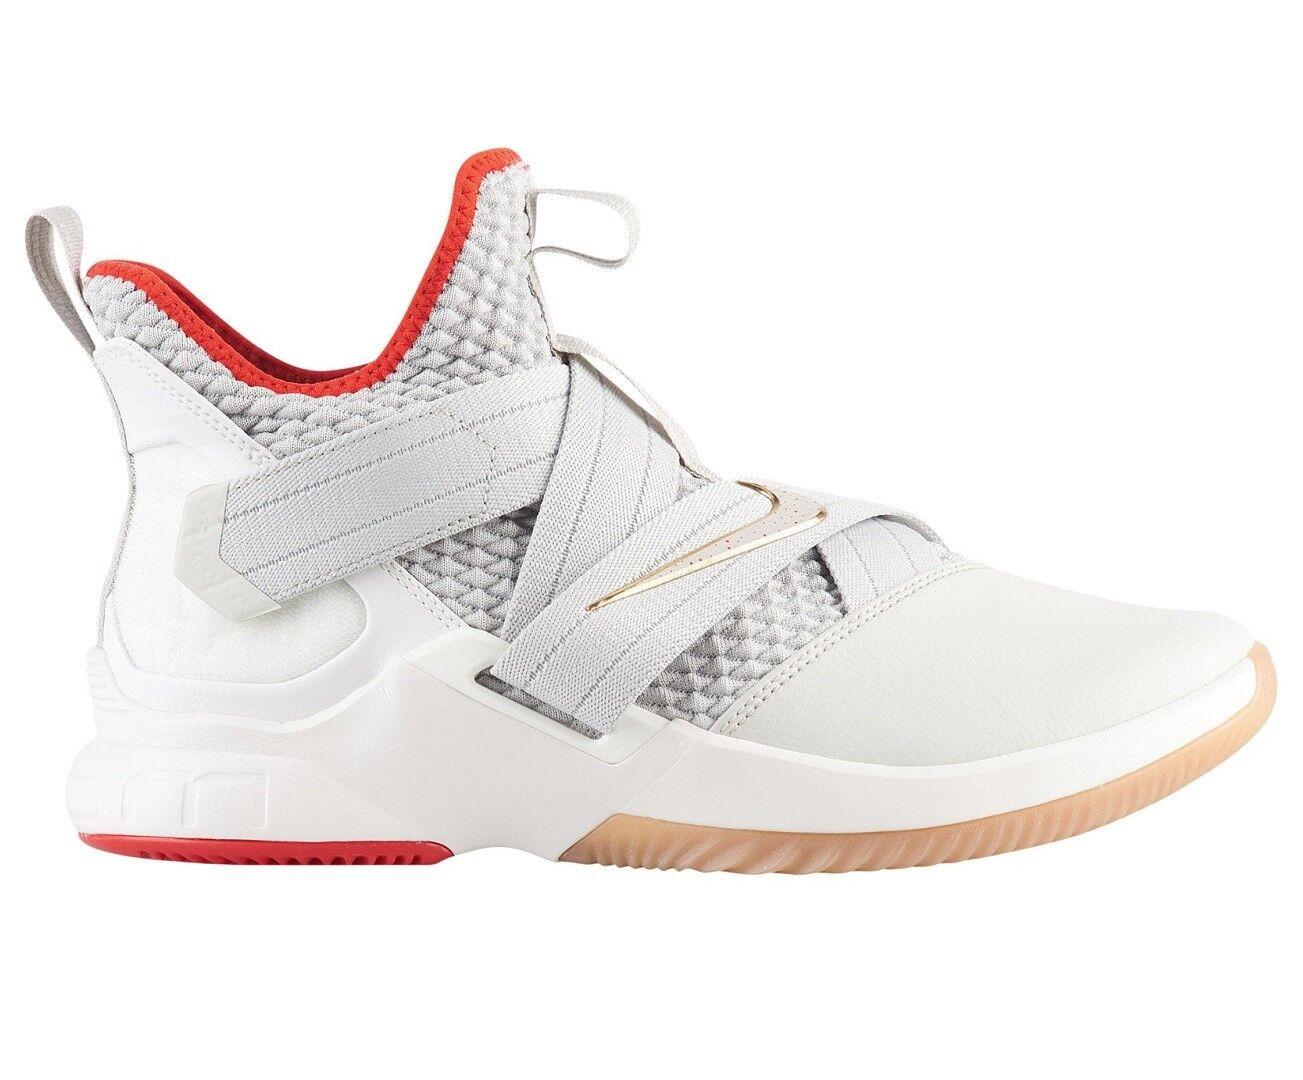 Nike Lebron Soldier XII 12 Mens AO2609-002 Light Bone Basketball Shoes Size 8